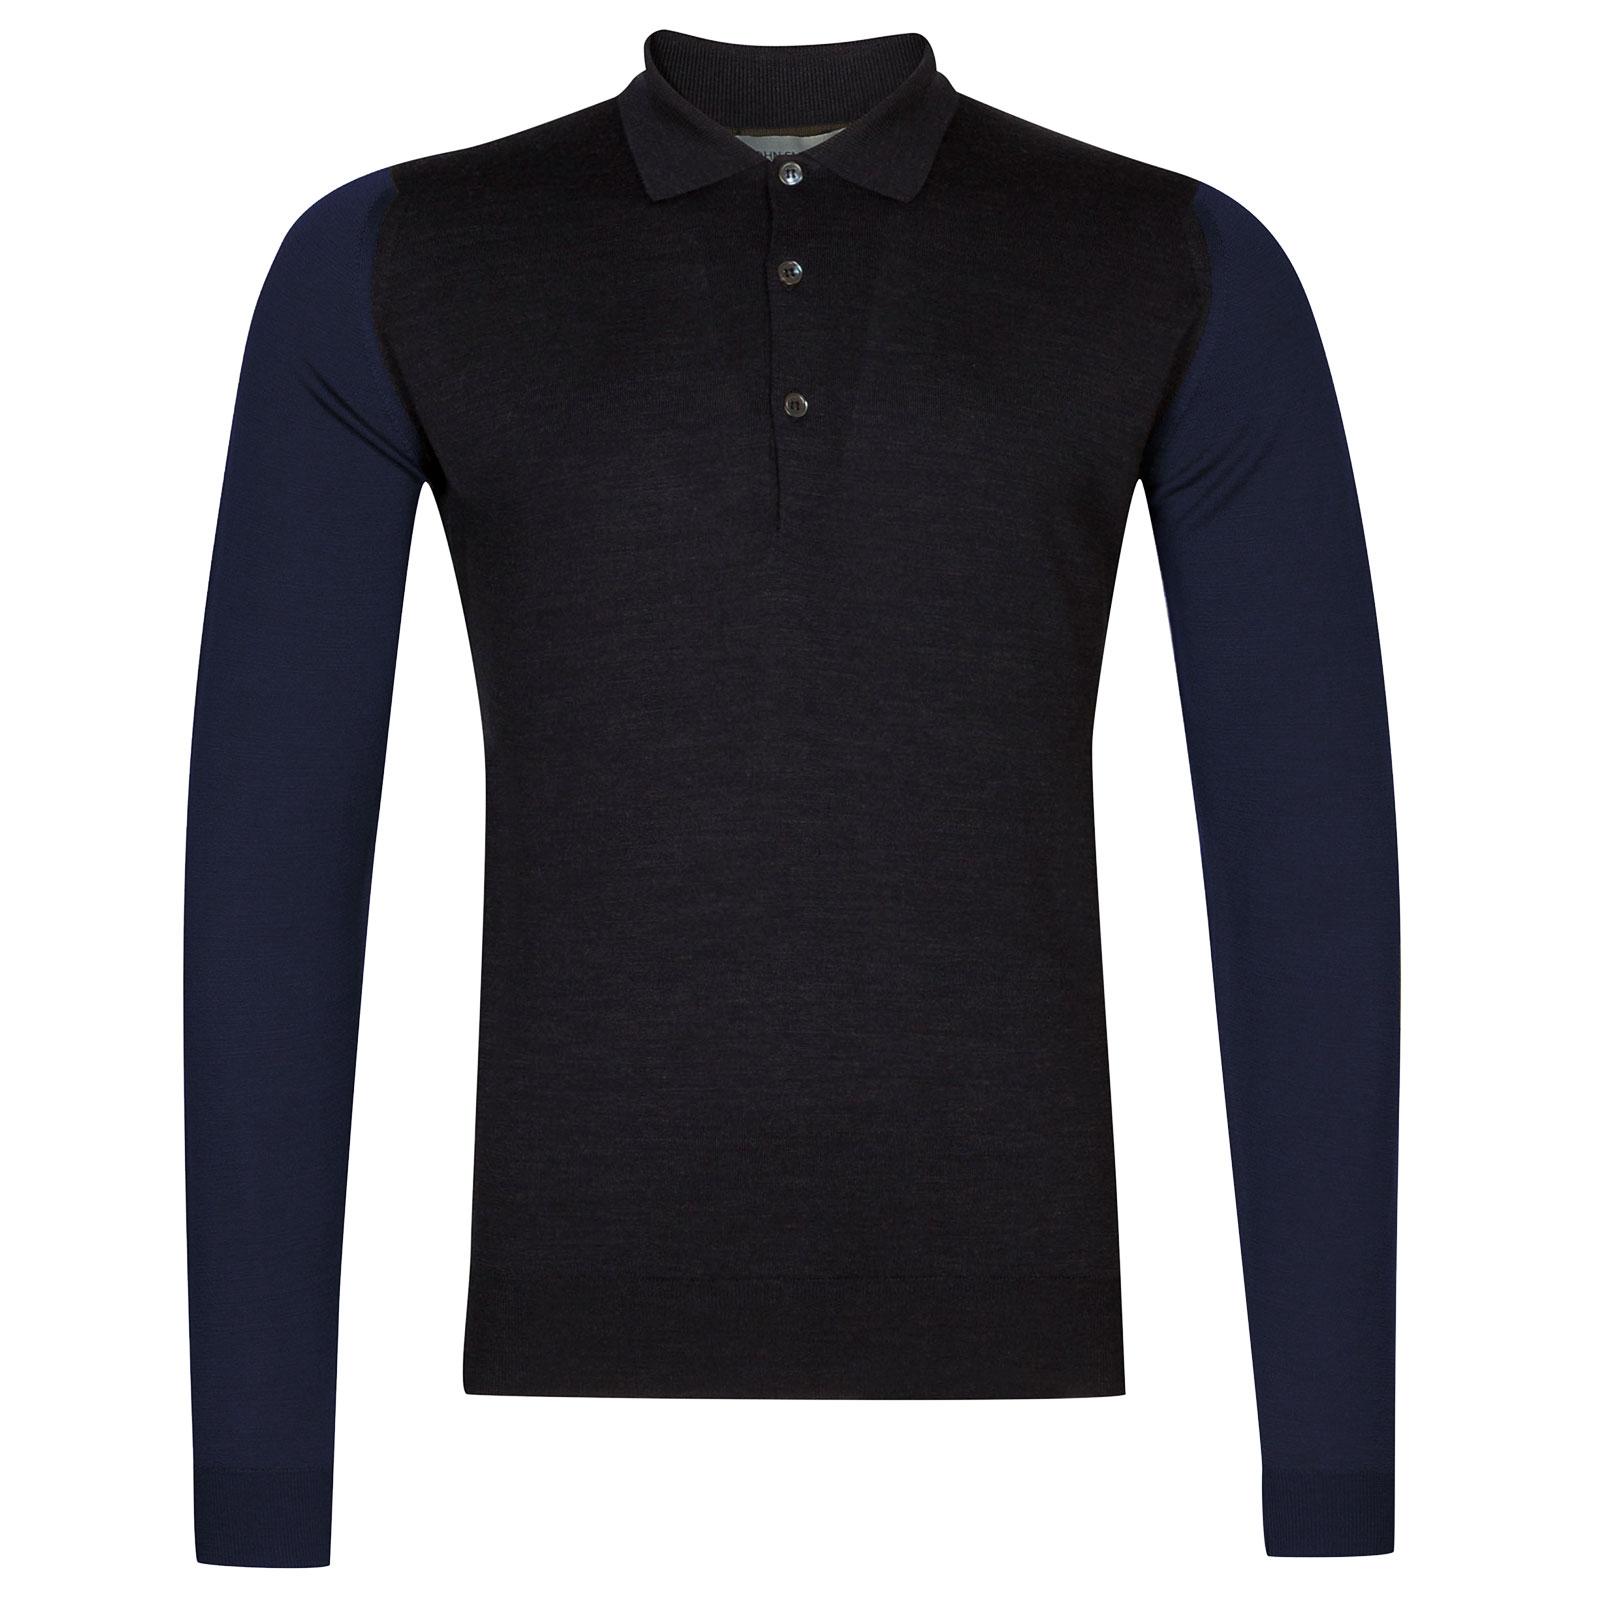 John Smedley Brightgate Extra Fine Merino Wool Shirt in Hepburn